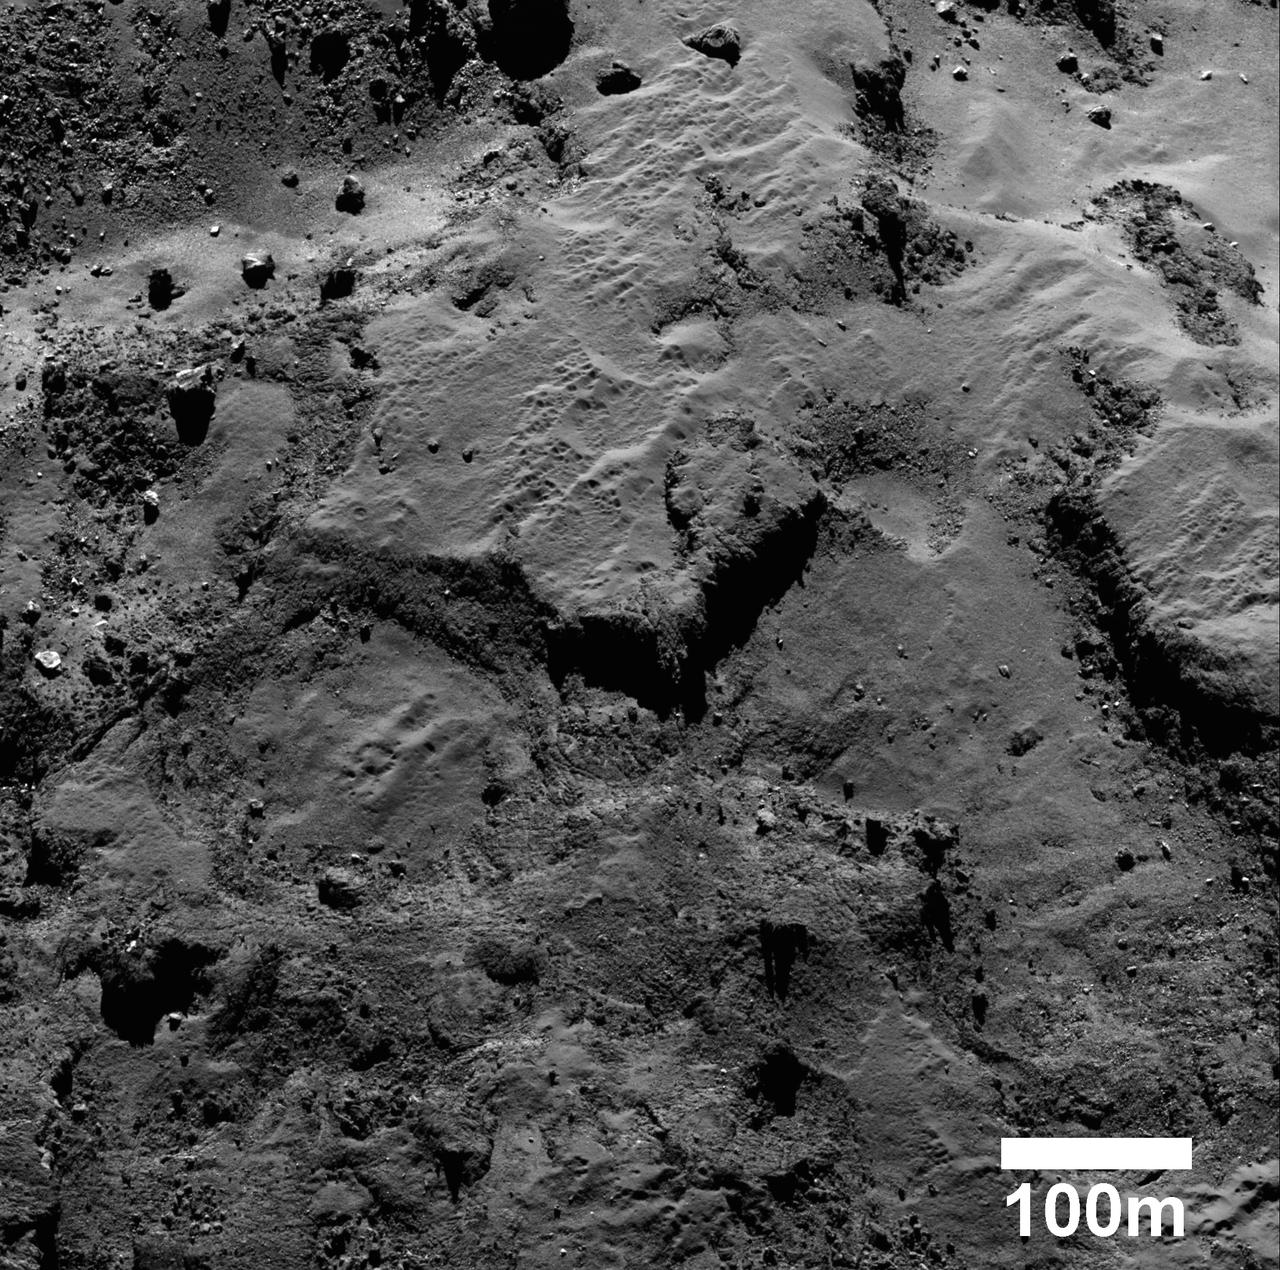 1567215975376-ESA_Rosetta_OSIRIS_Maftet_1280.jpg